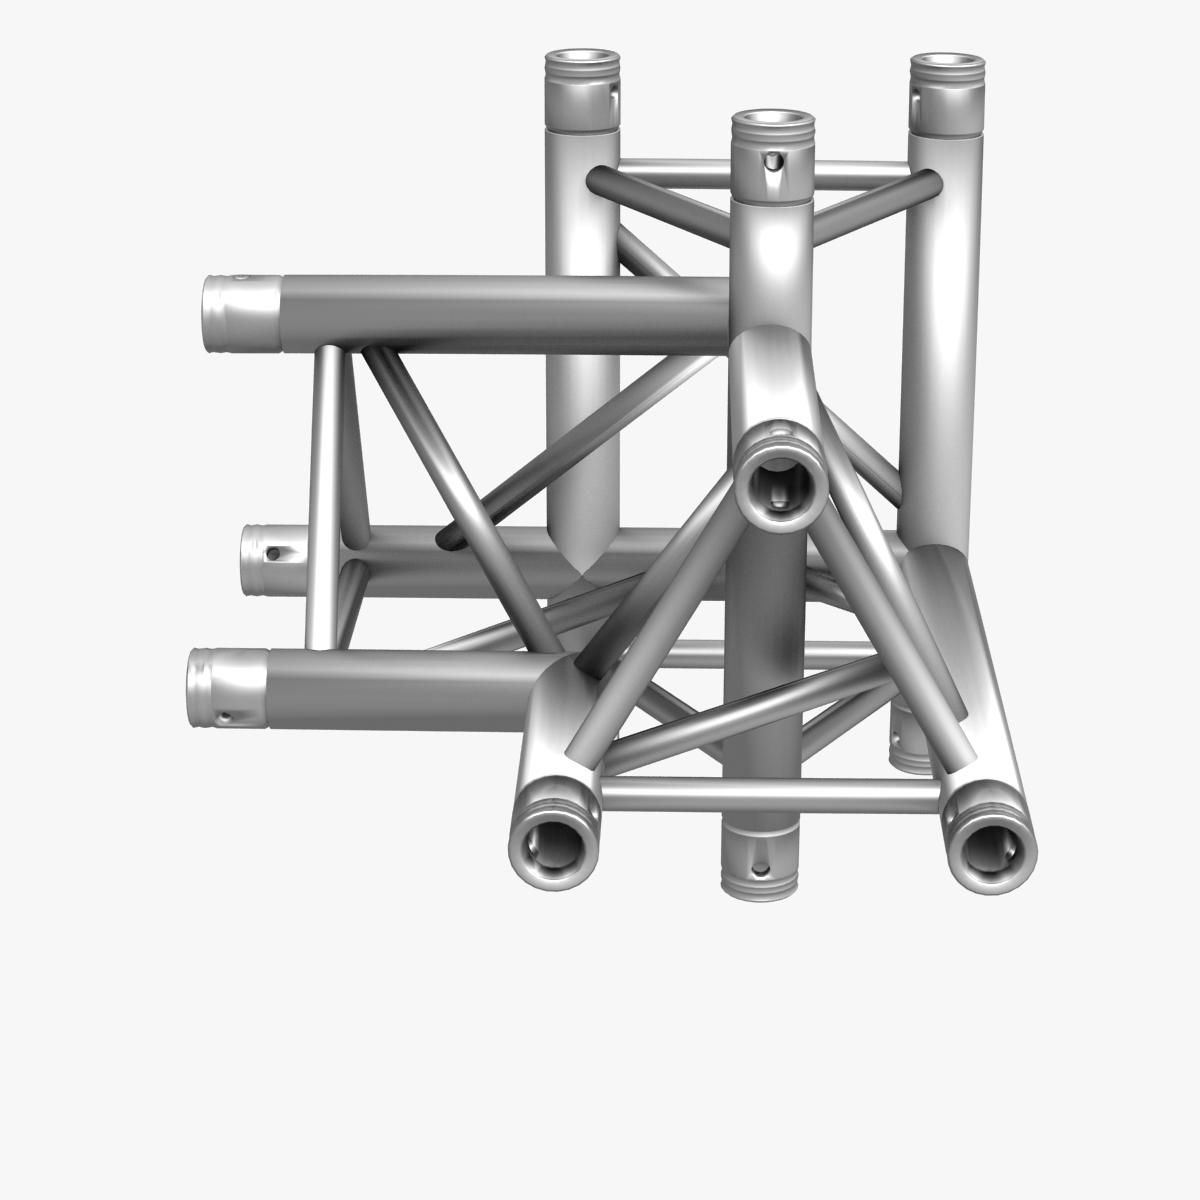 triangular trusses (collection 55 modular pieces) 3d model 3ds max dxf fbx c4d dae texture obj 216242